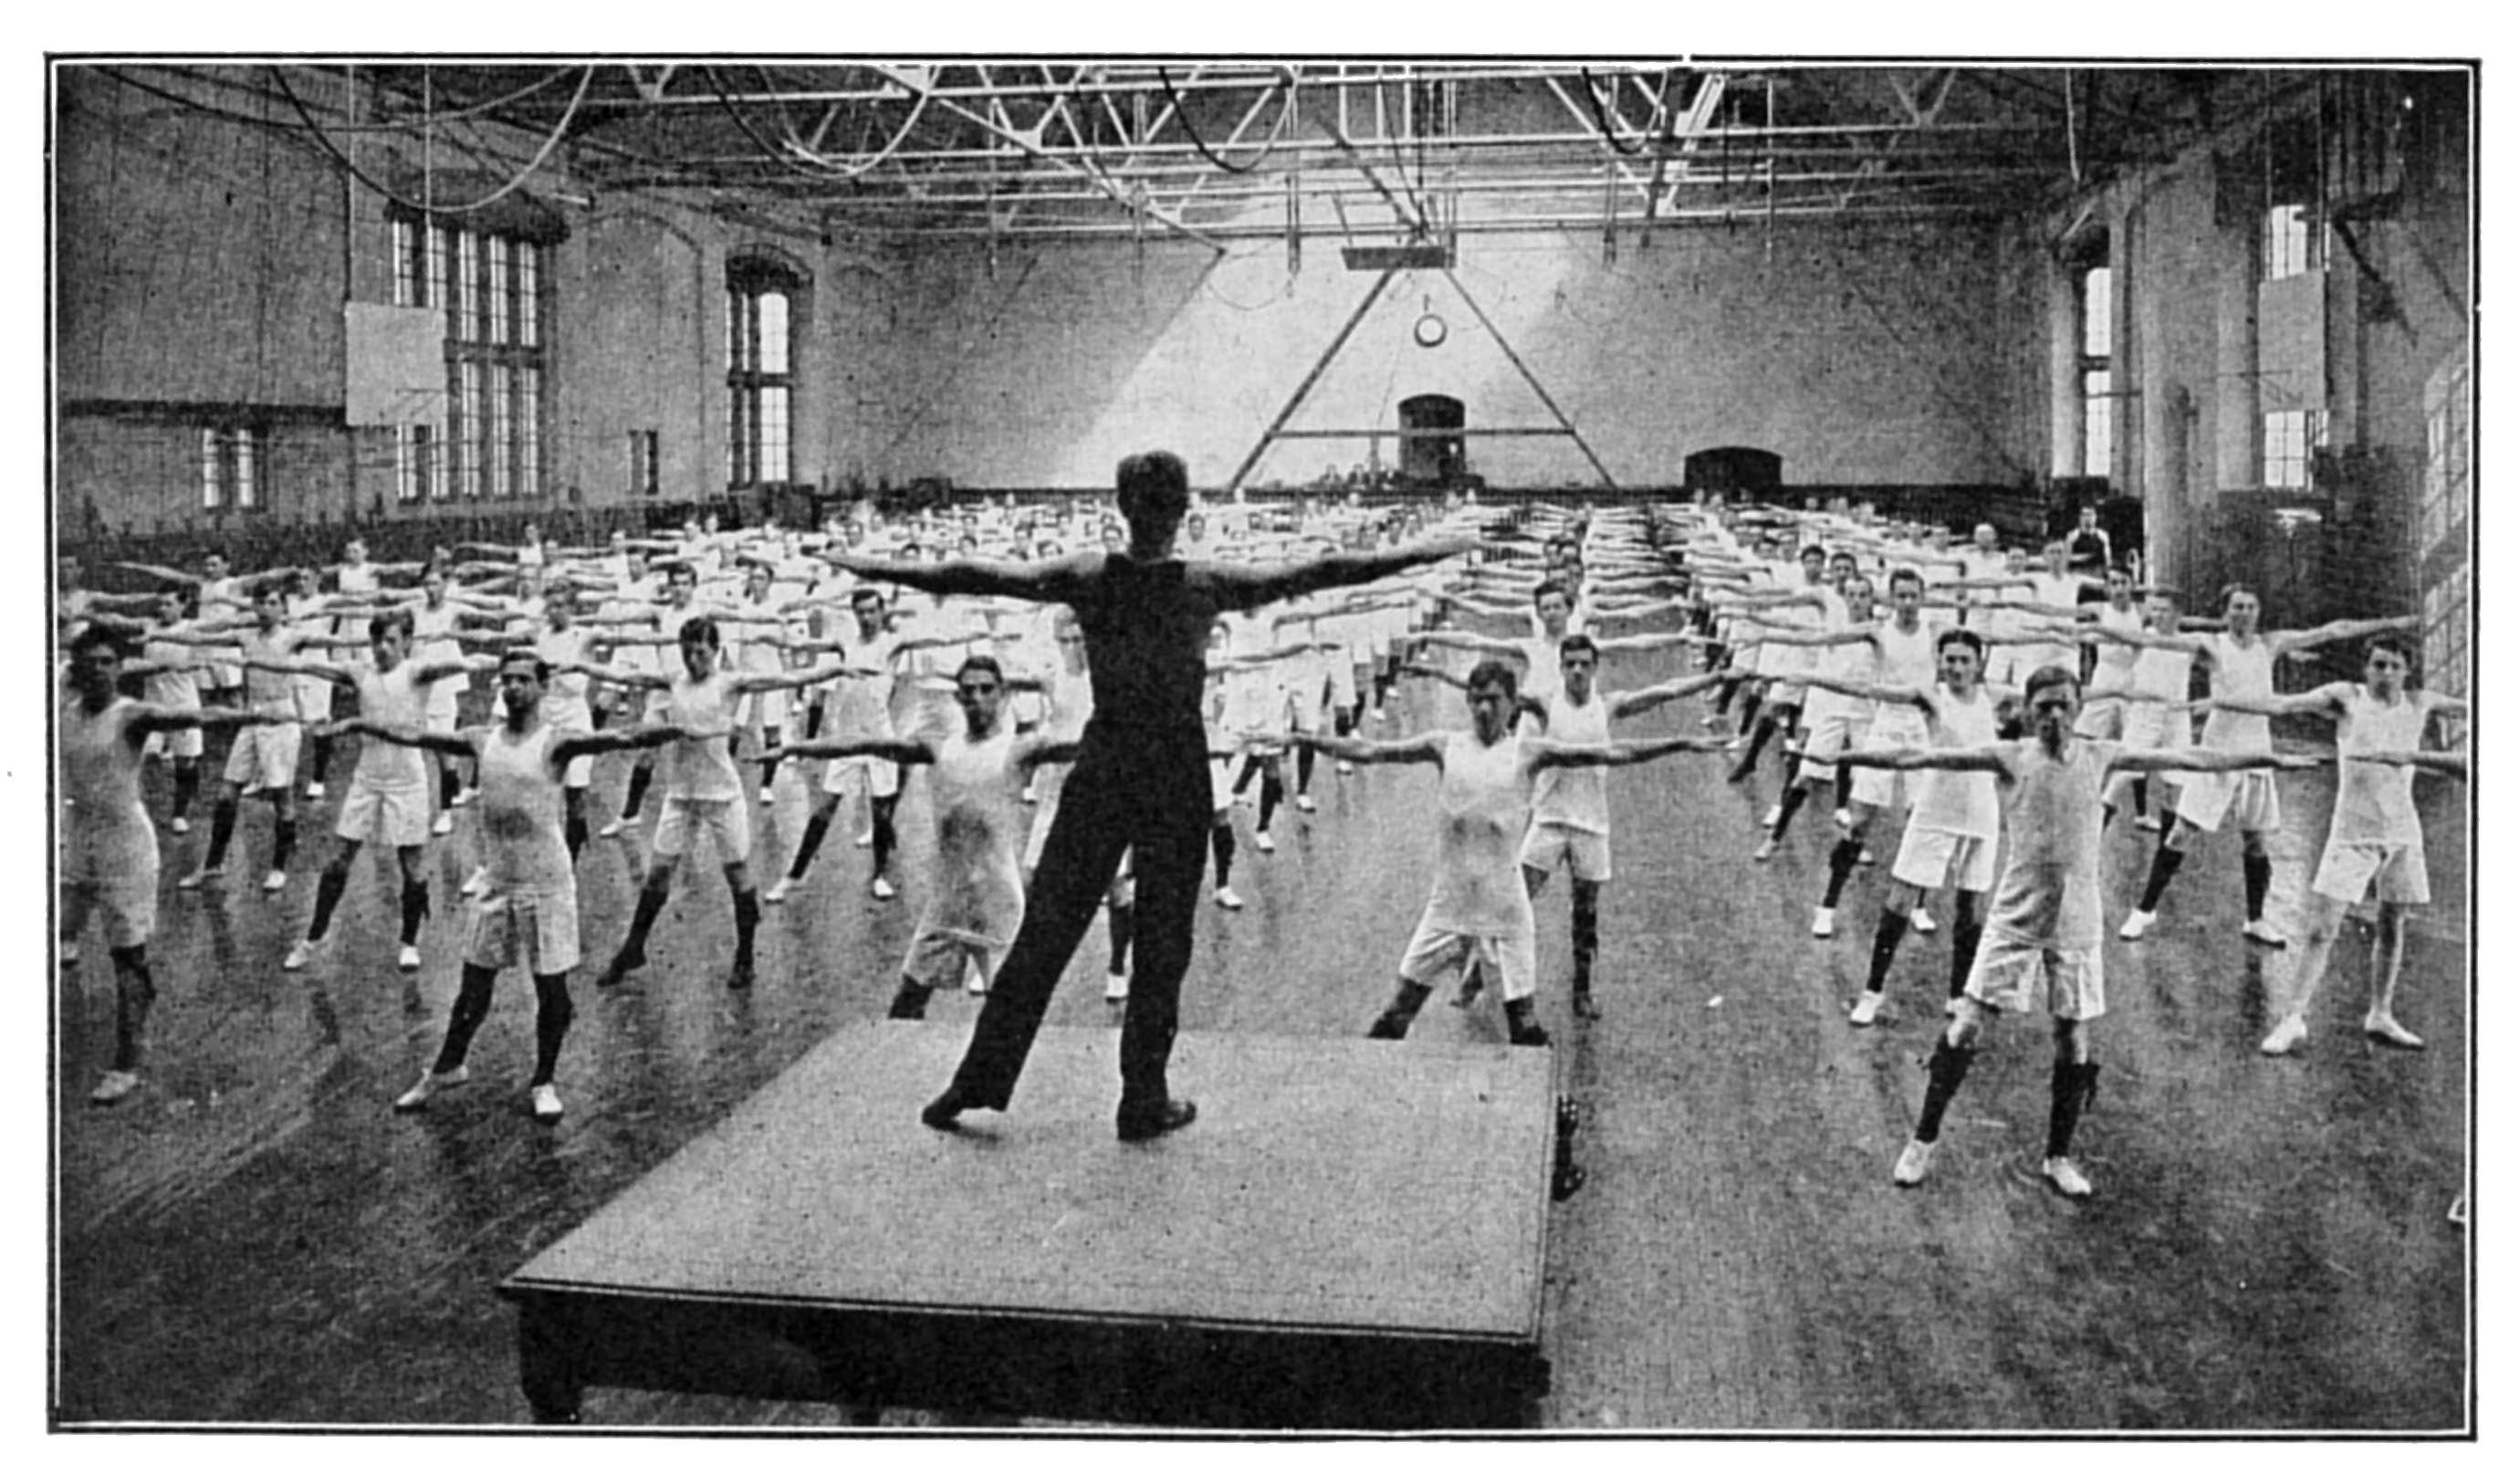 Essay on the history of gymnastics